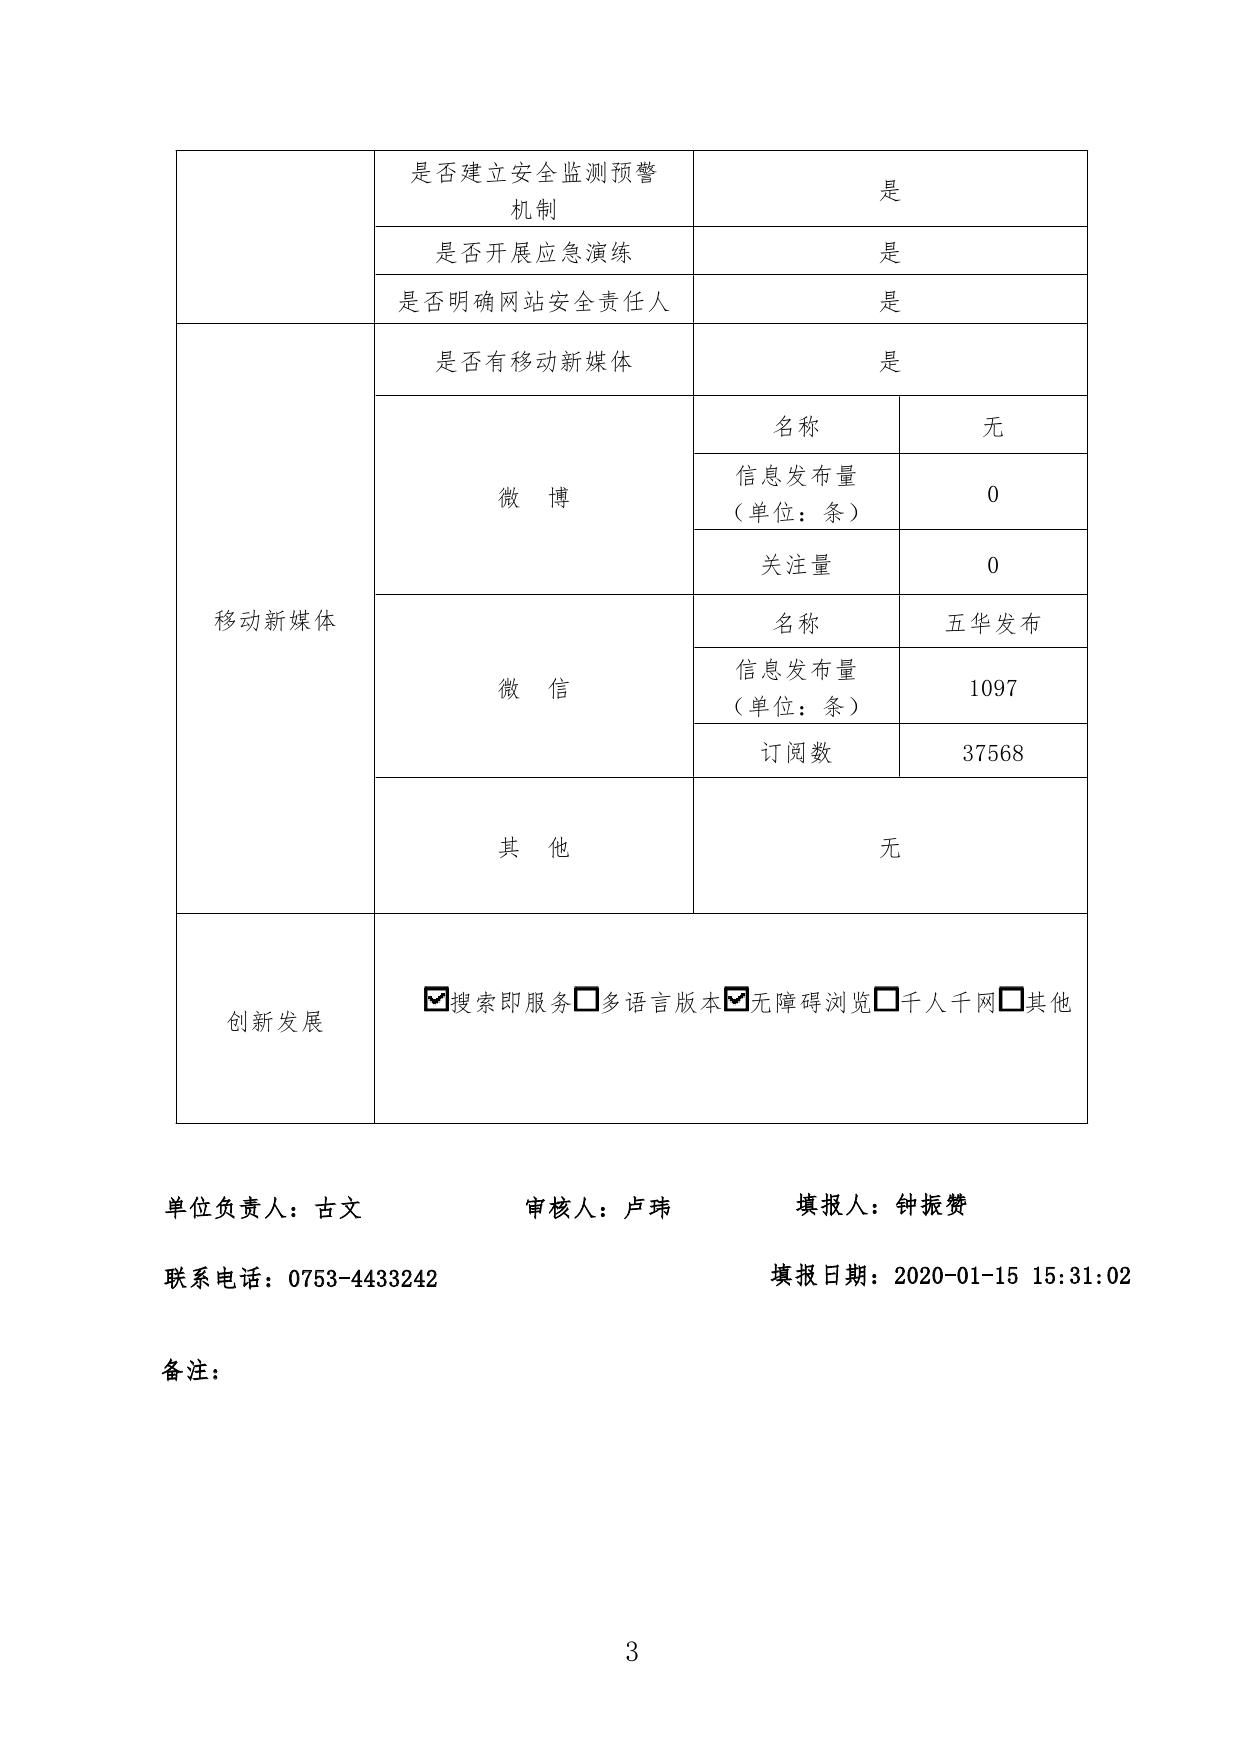 report_tb_44142400010002.jpg